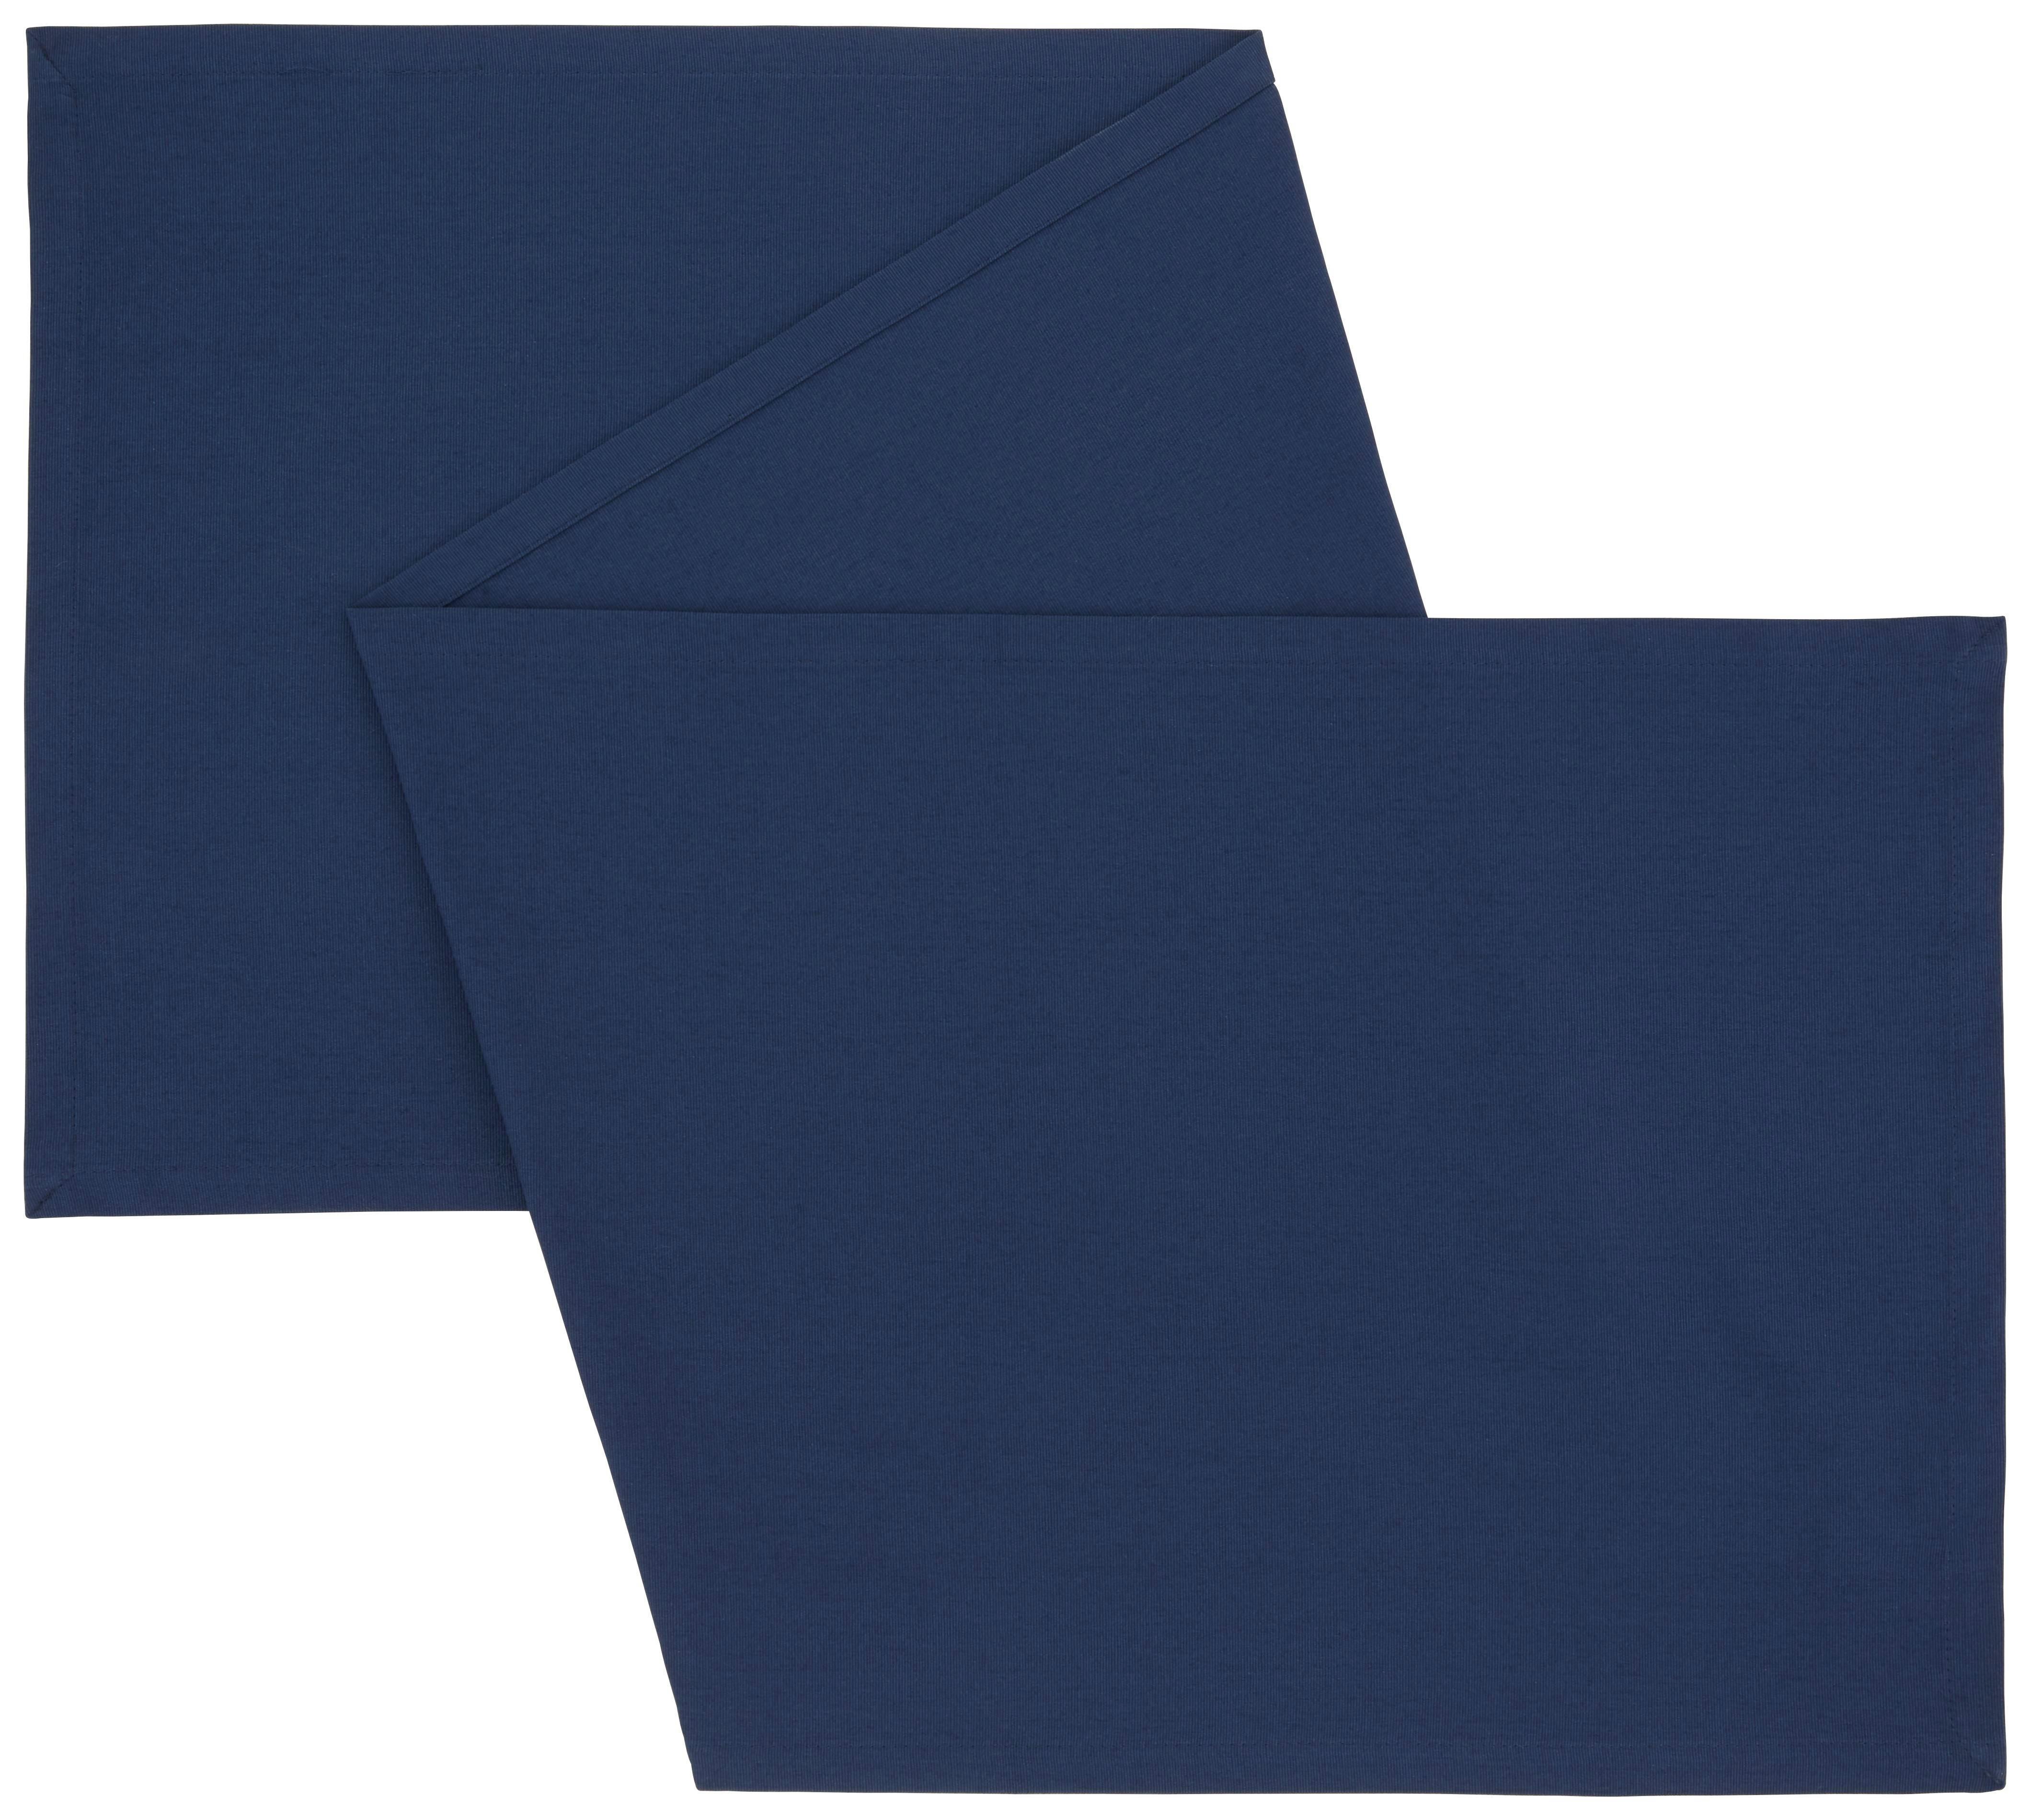 Nadprt Steffi - temno modra, tekstil (45/150cm) - MÖMAX modern living